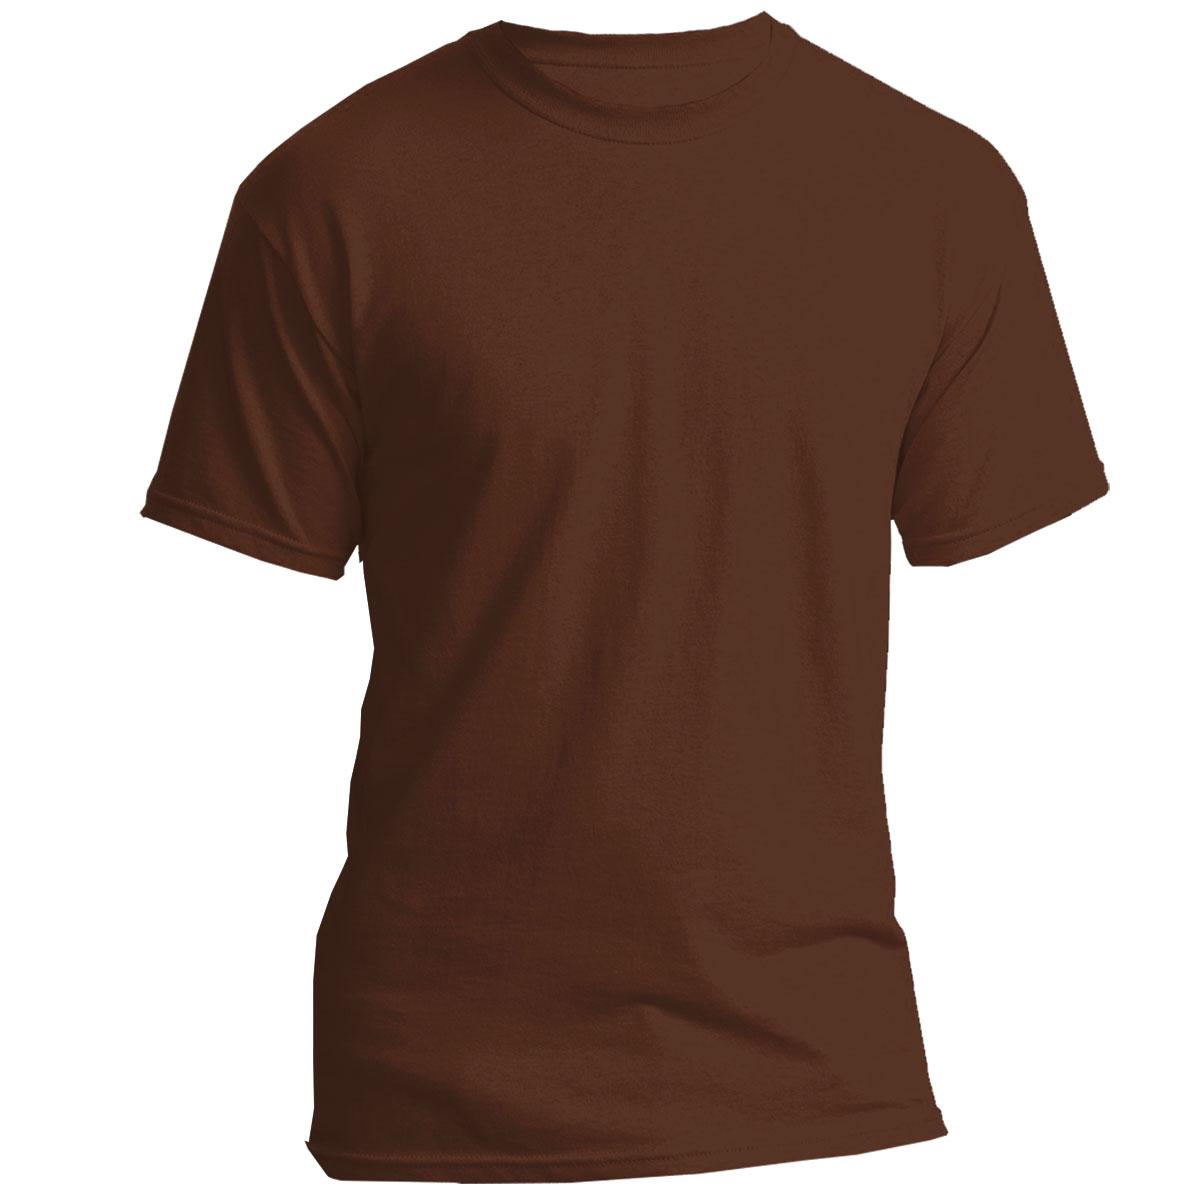 c7db76fd3525 T-shirt Regular Premium for printing Basic weight: 190 g/m² Size: L Colour: dark  brown